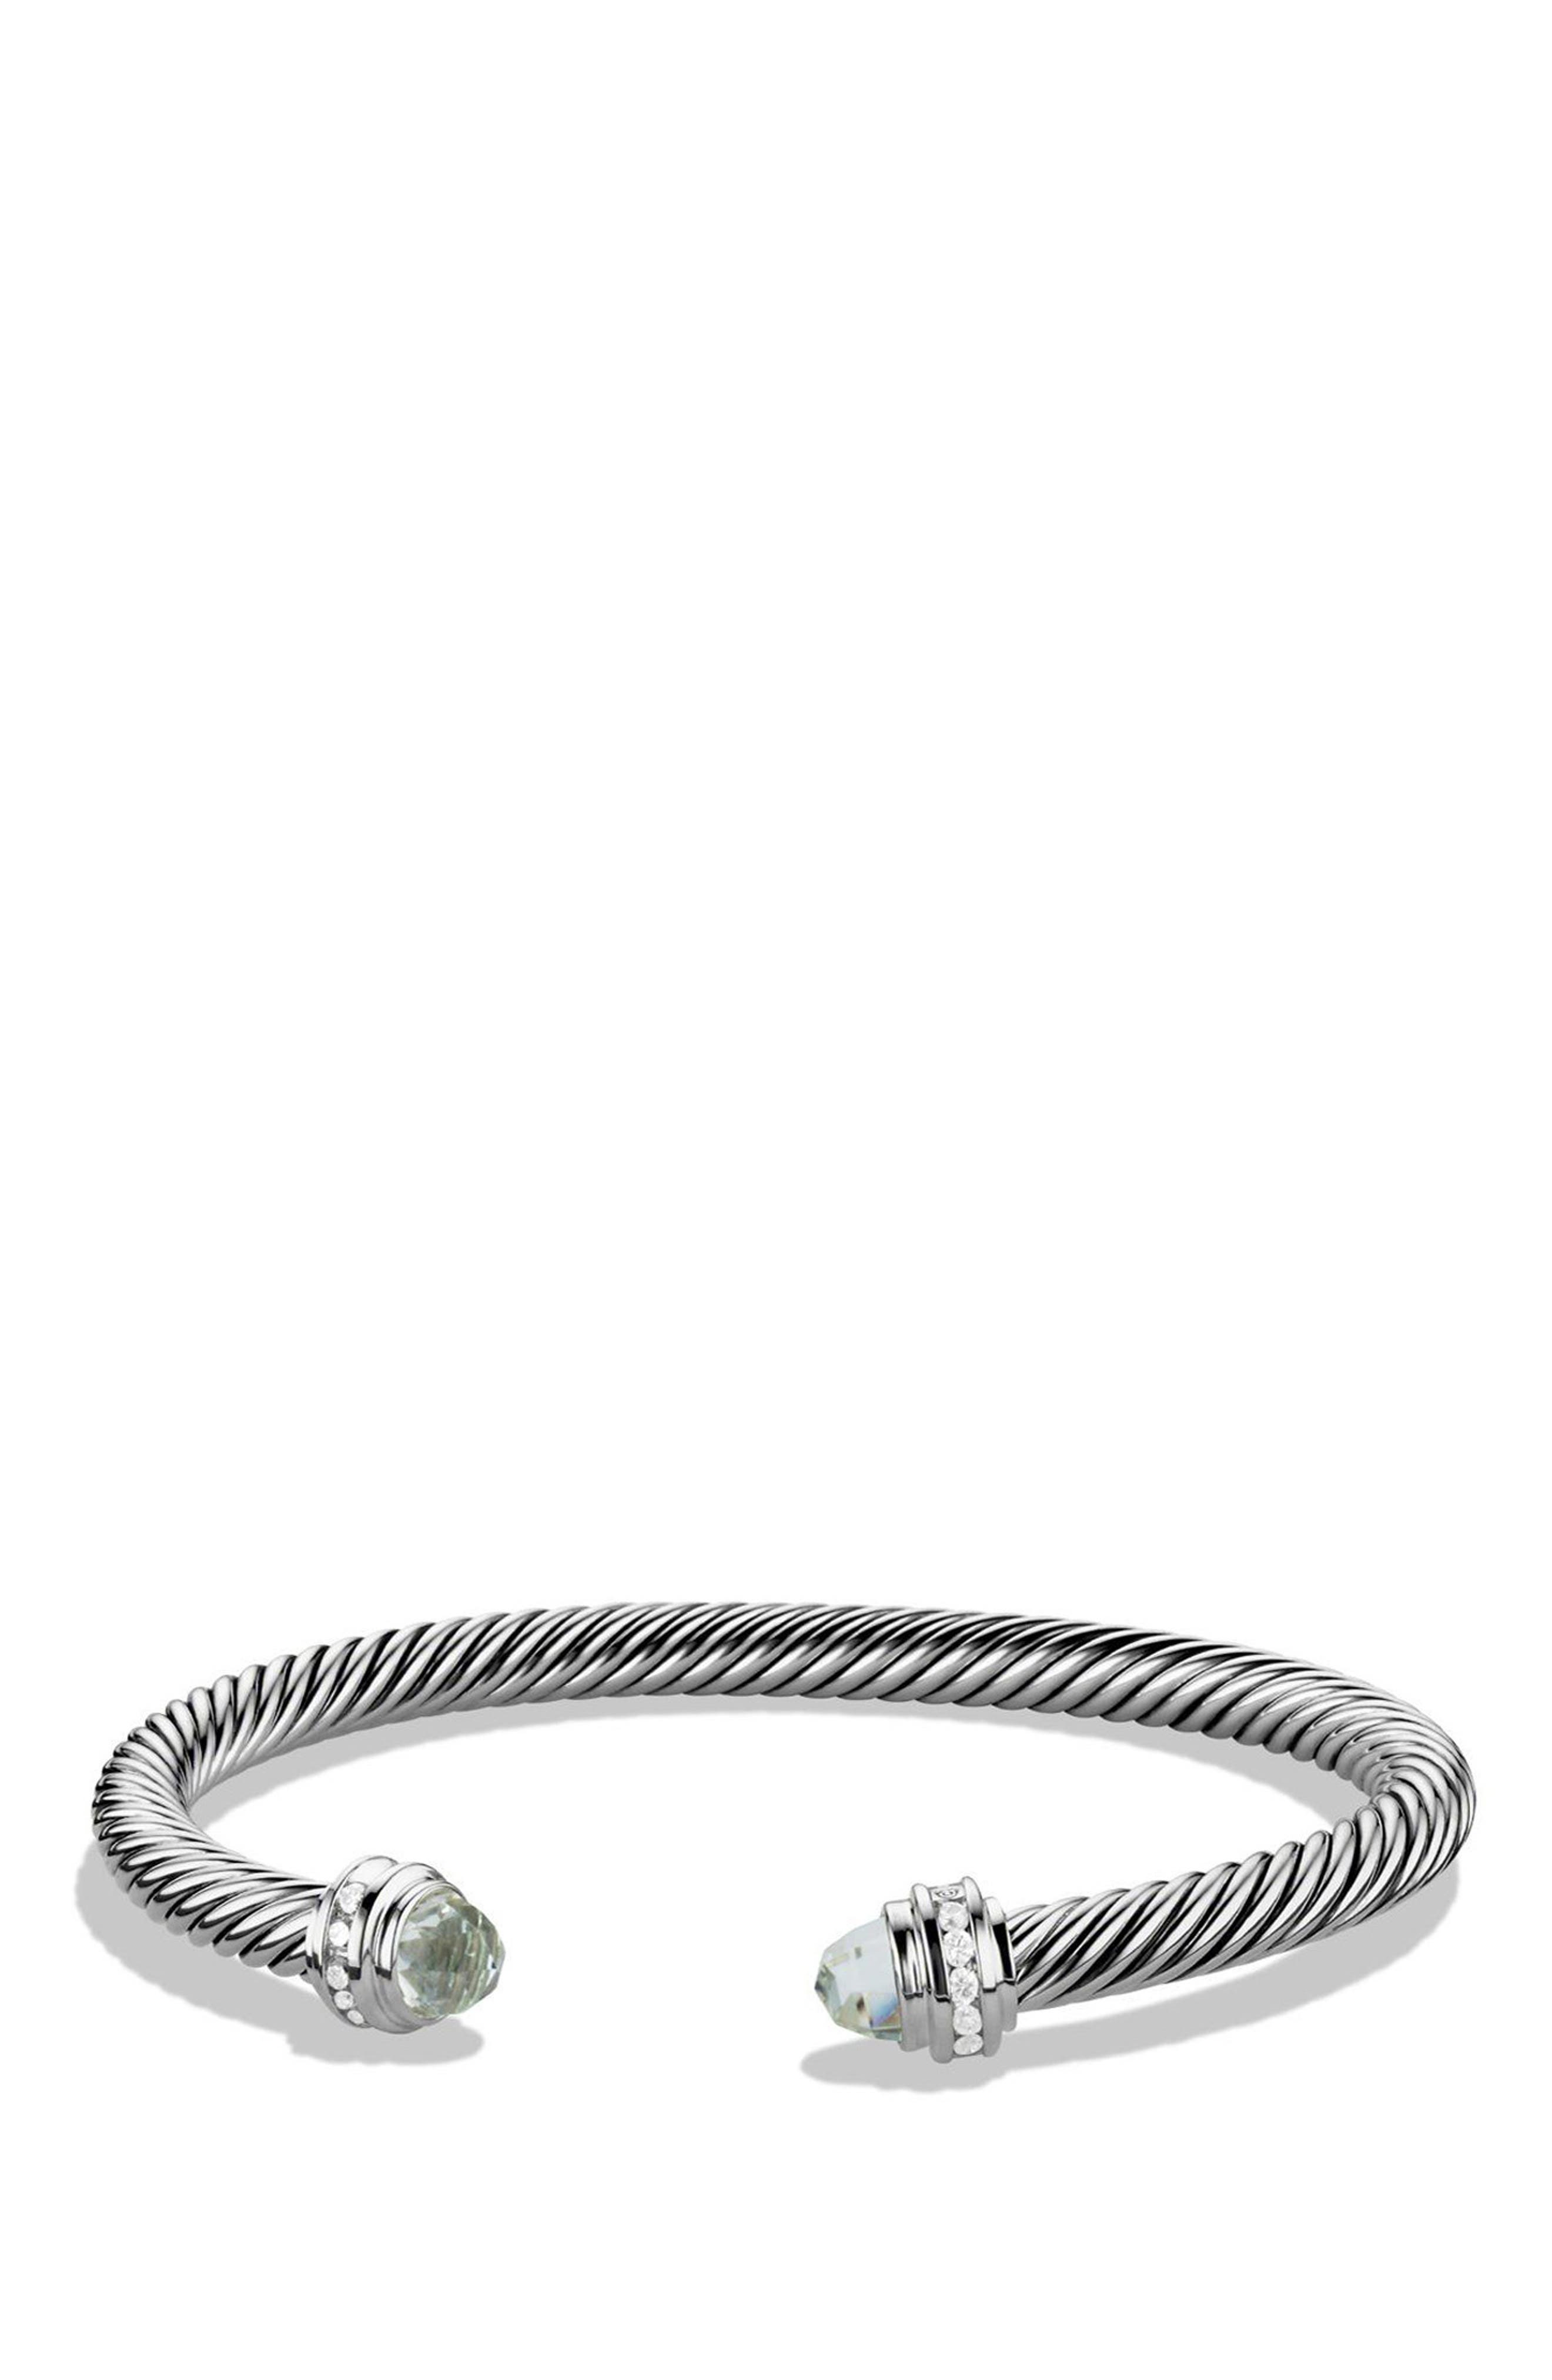 Cable Classics Bracelet with Semiprecious Stones & Diamonds, 5mm,                         Main,                         color, PRASIOLITE